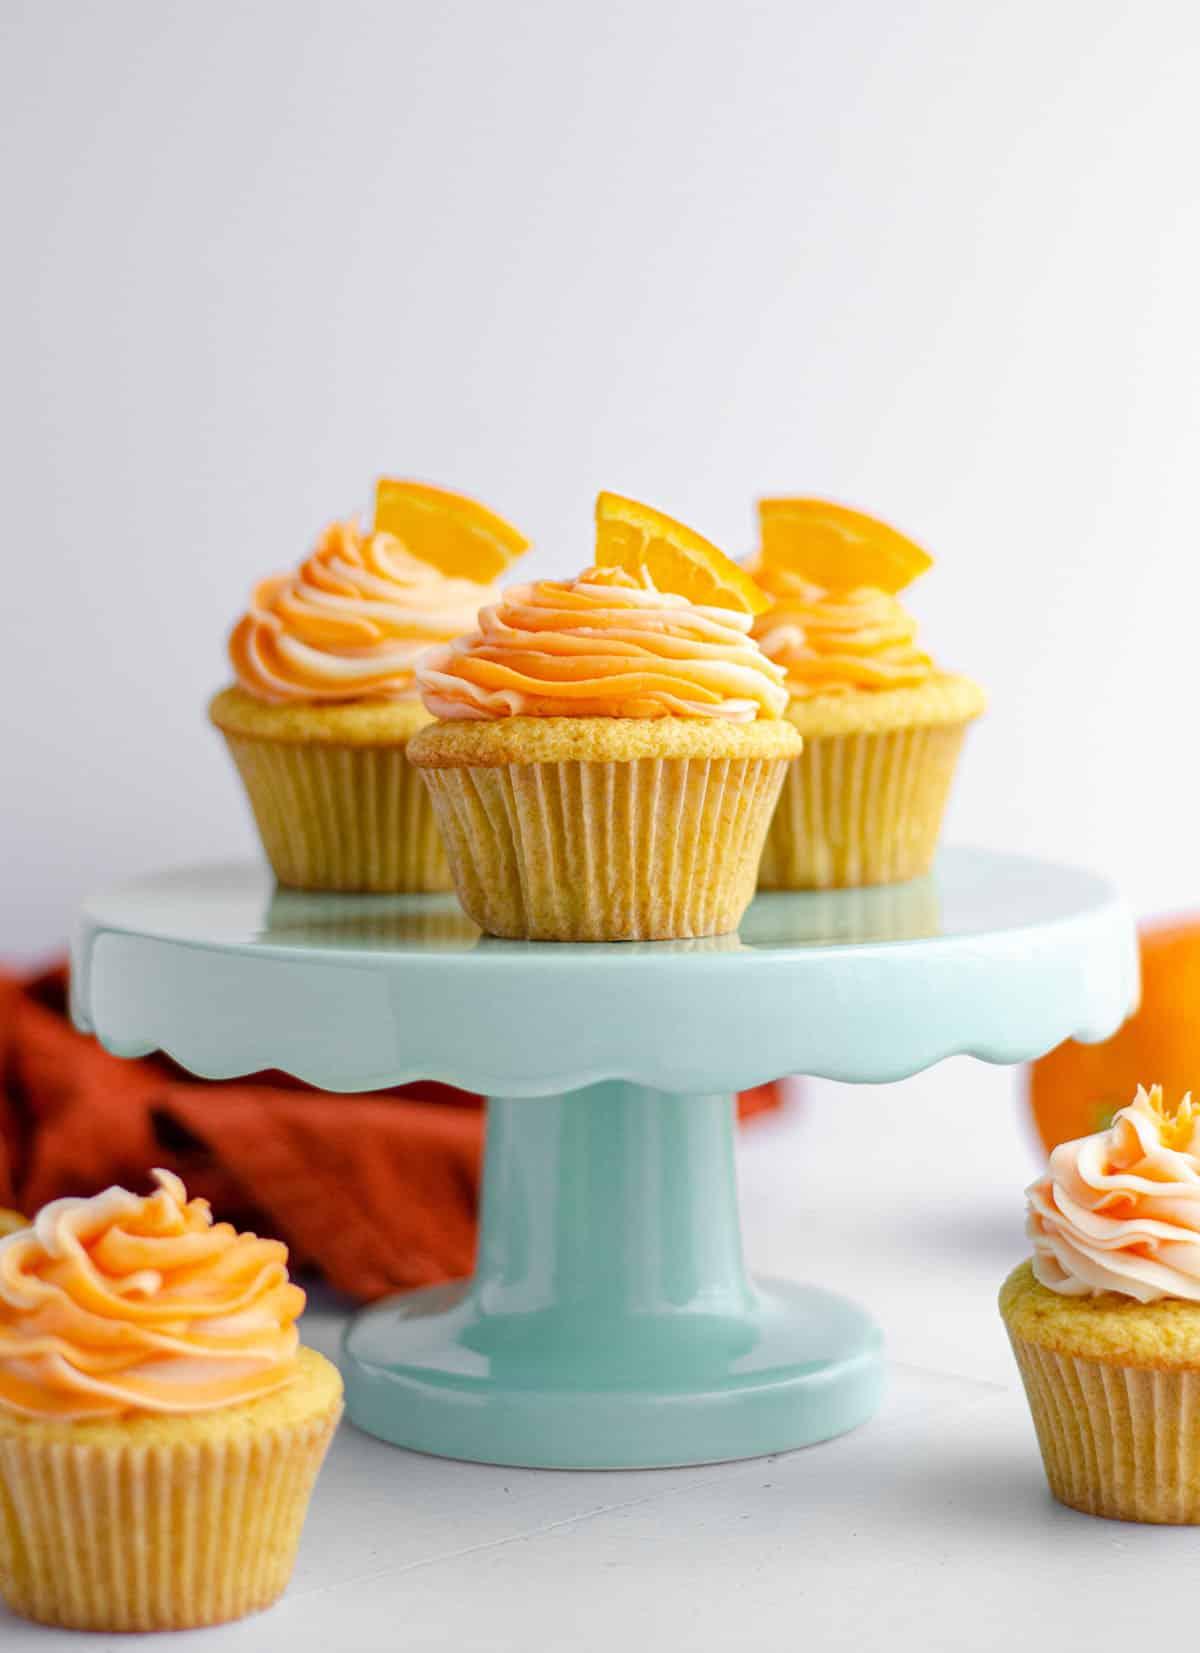 orange creamsicle cupcakes on a light blue cupcake stand